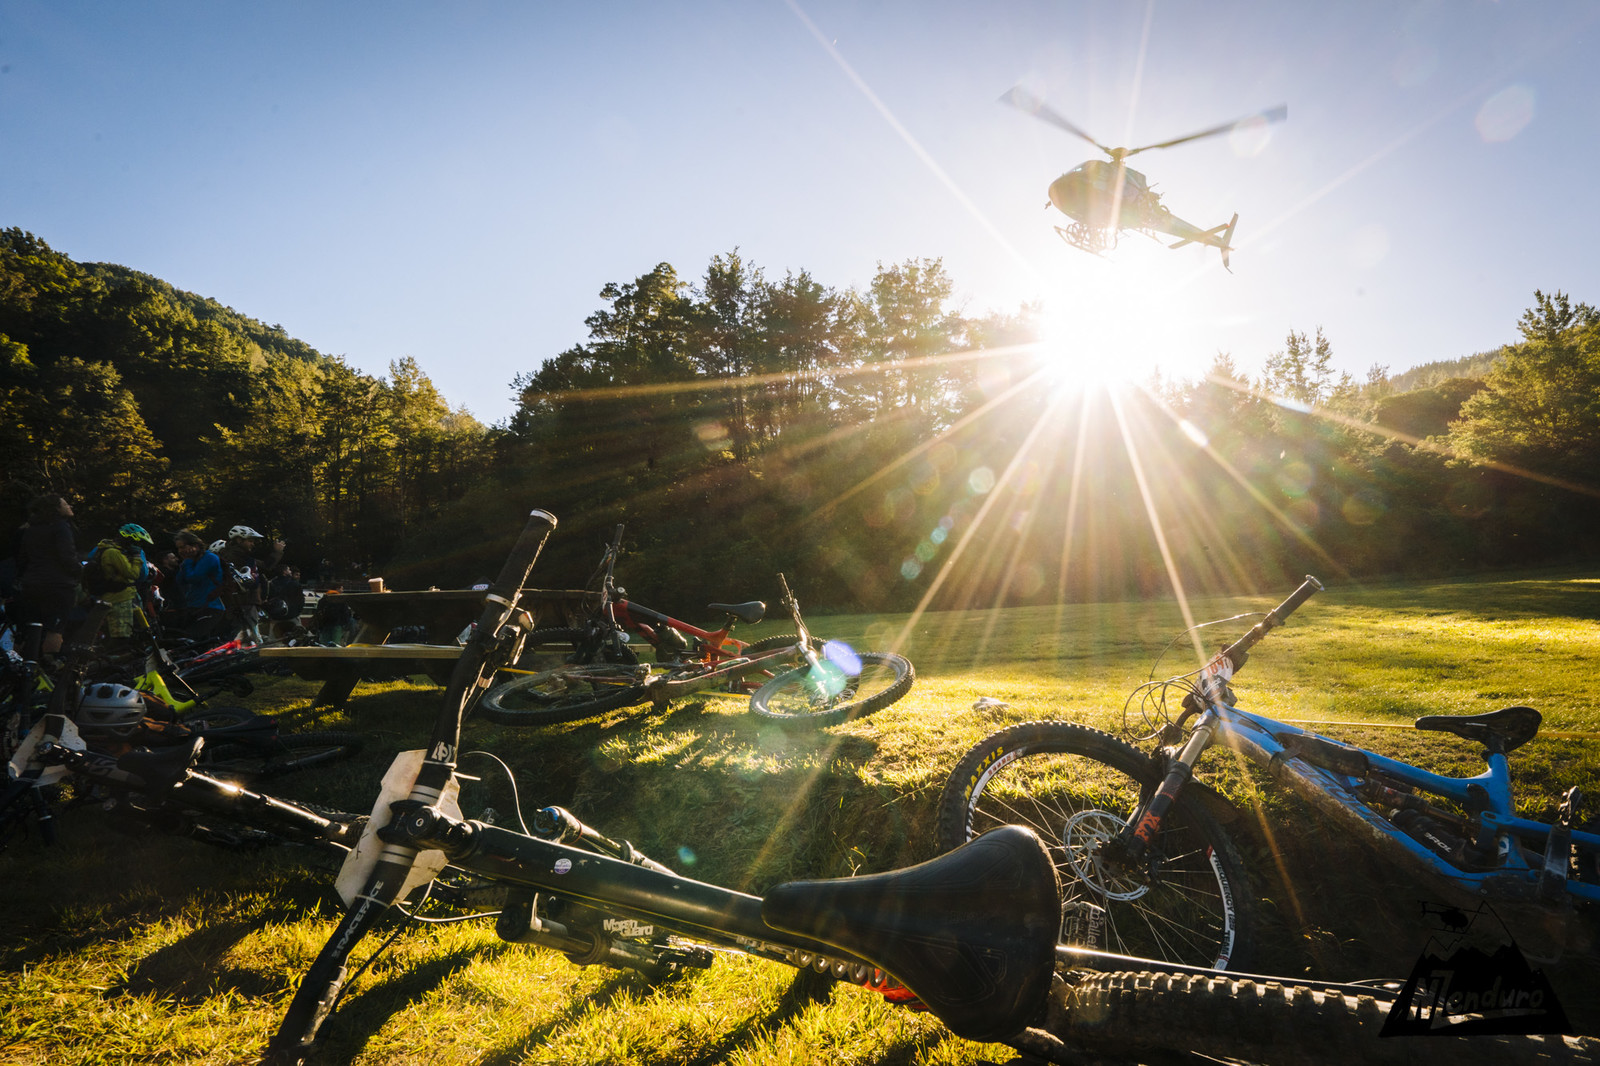 Entries Open for 2019 Santa Cruz NZ Enduro